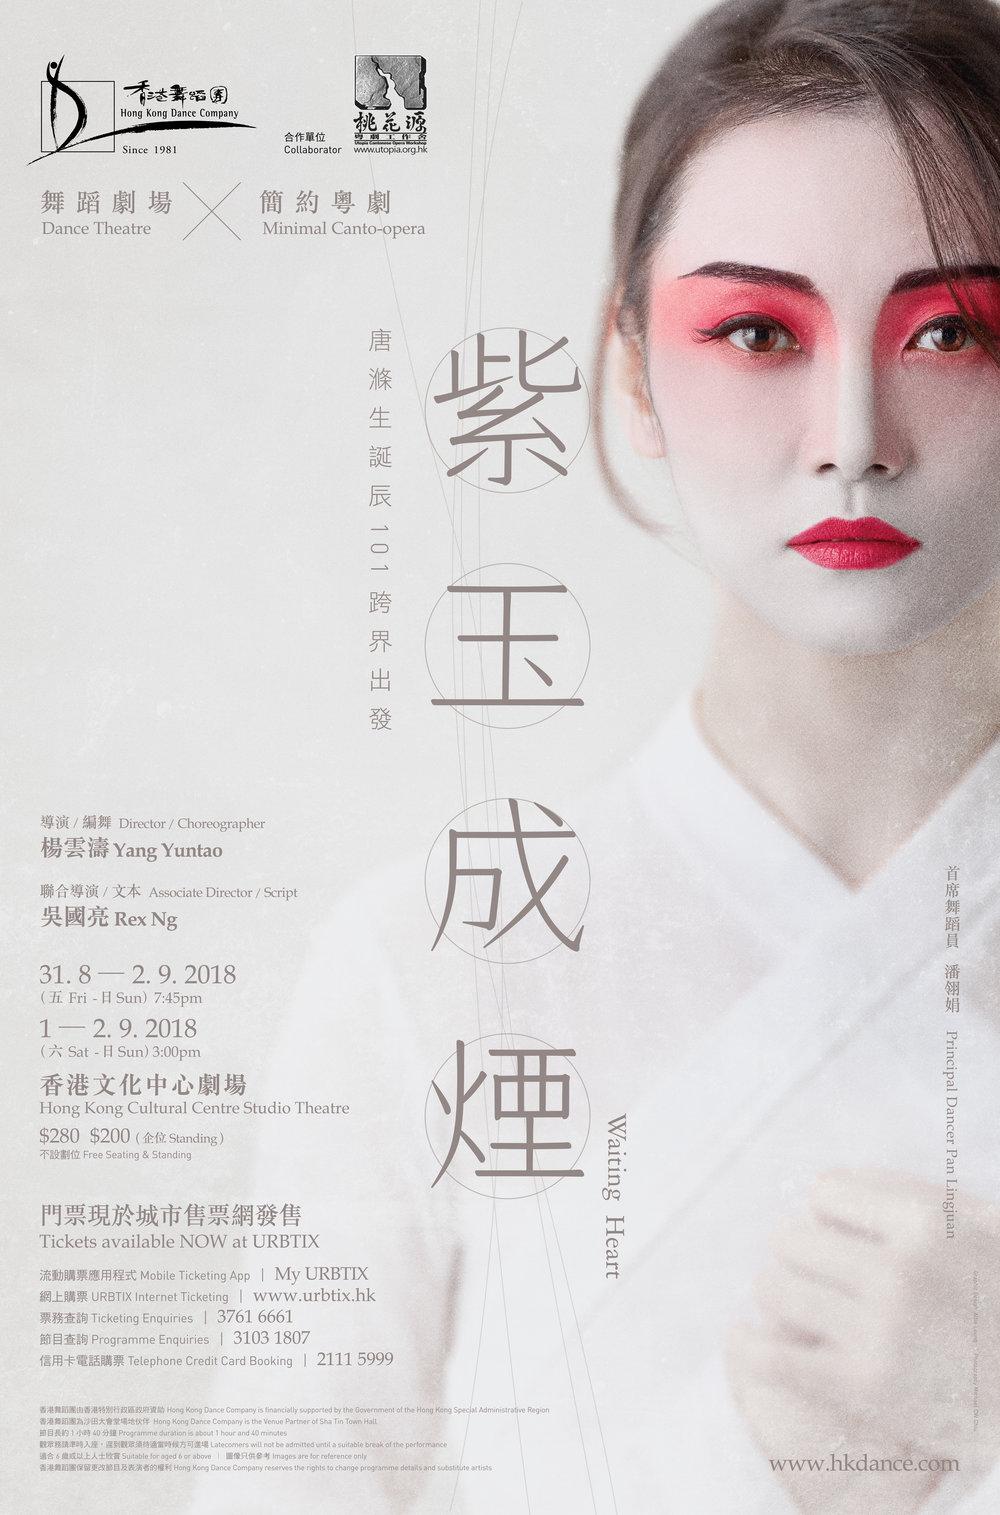 HK DANCE. 紫玉成煙 (Waiting Heart) Poster. 2018